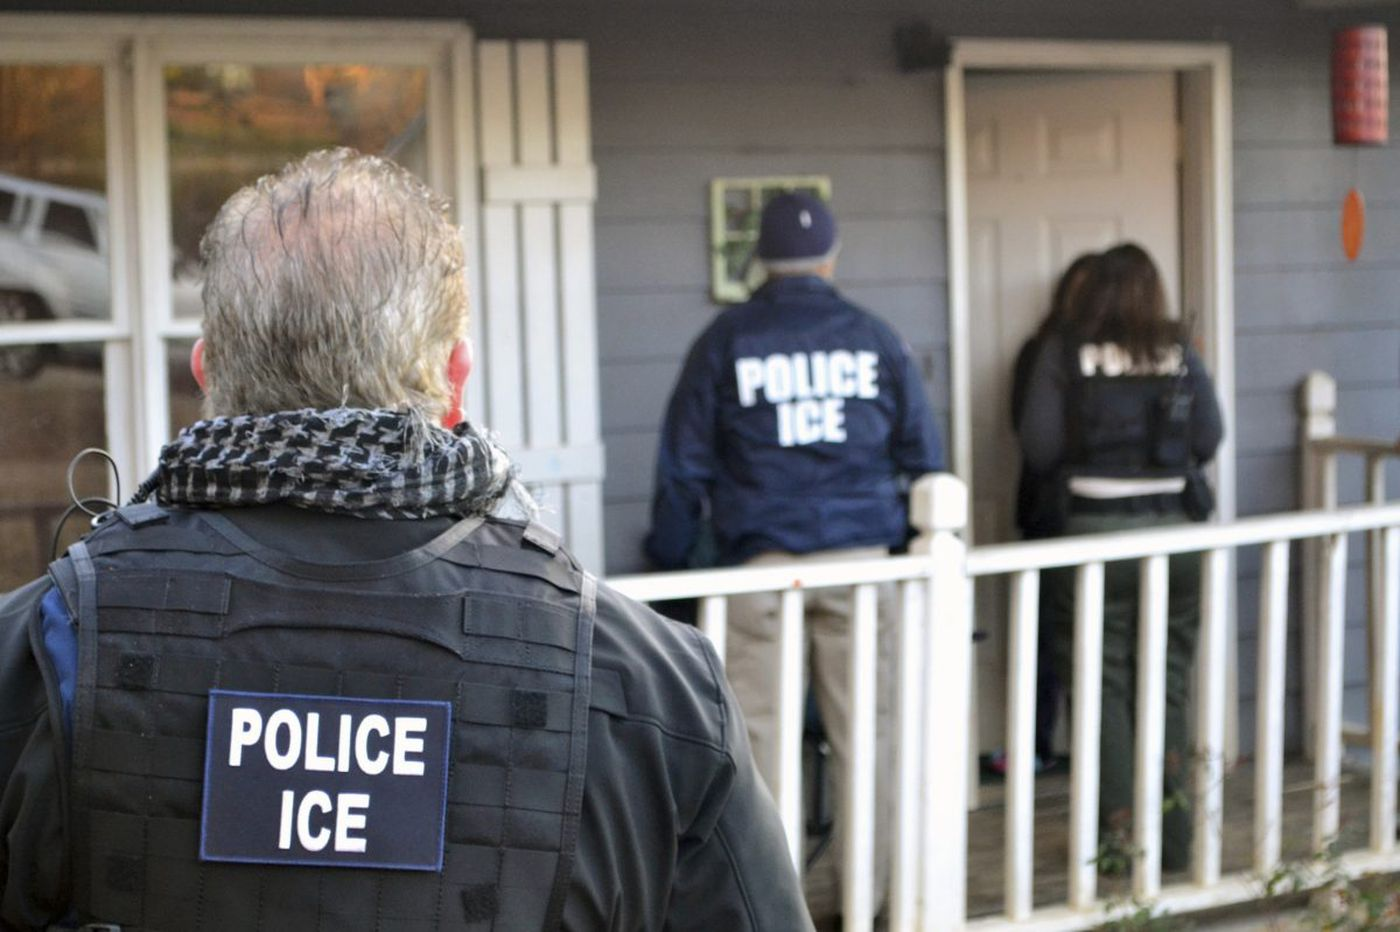 Bensalem seeks ICE immigration partnership amid opposition